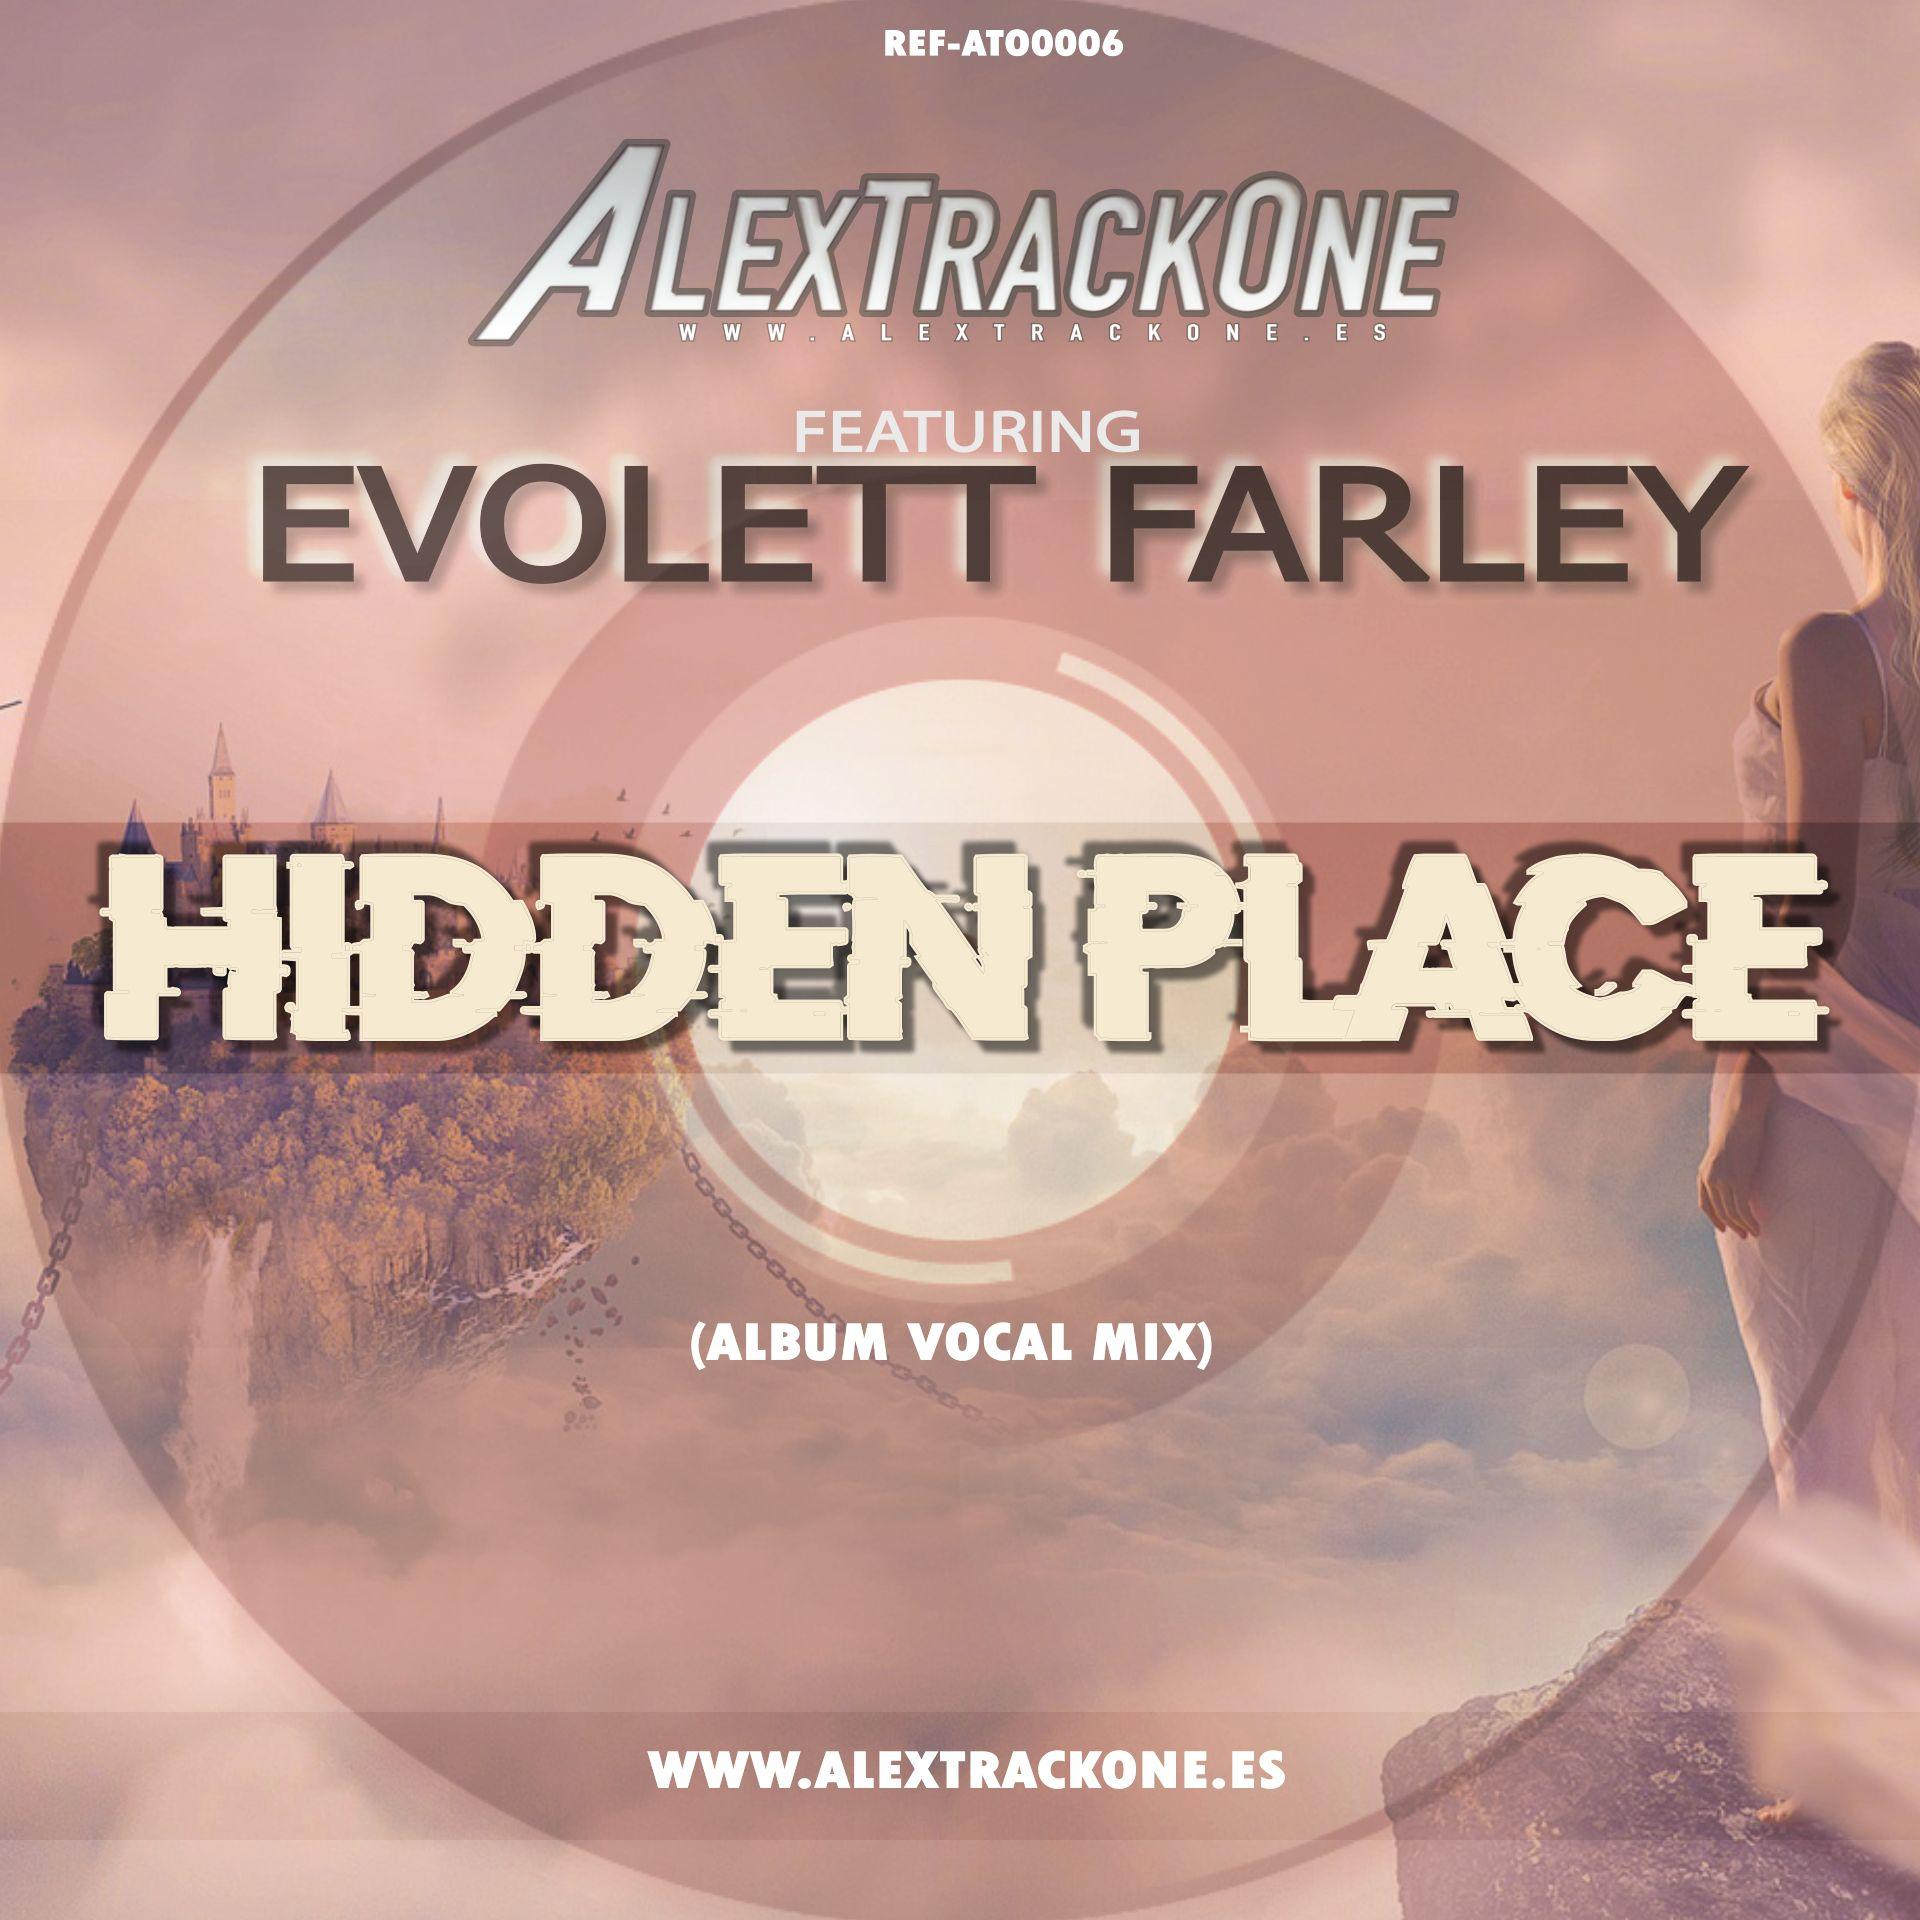 REF-ATO0006 FEAT EVOLETT FARLEY HIDDEN PLACE (ORIGINAL MIX) (WAV & MP3)